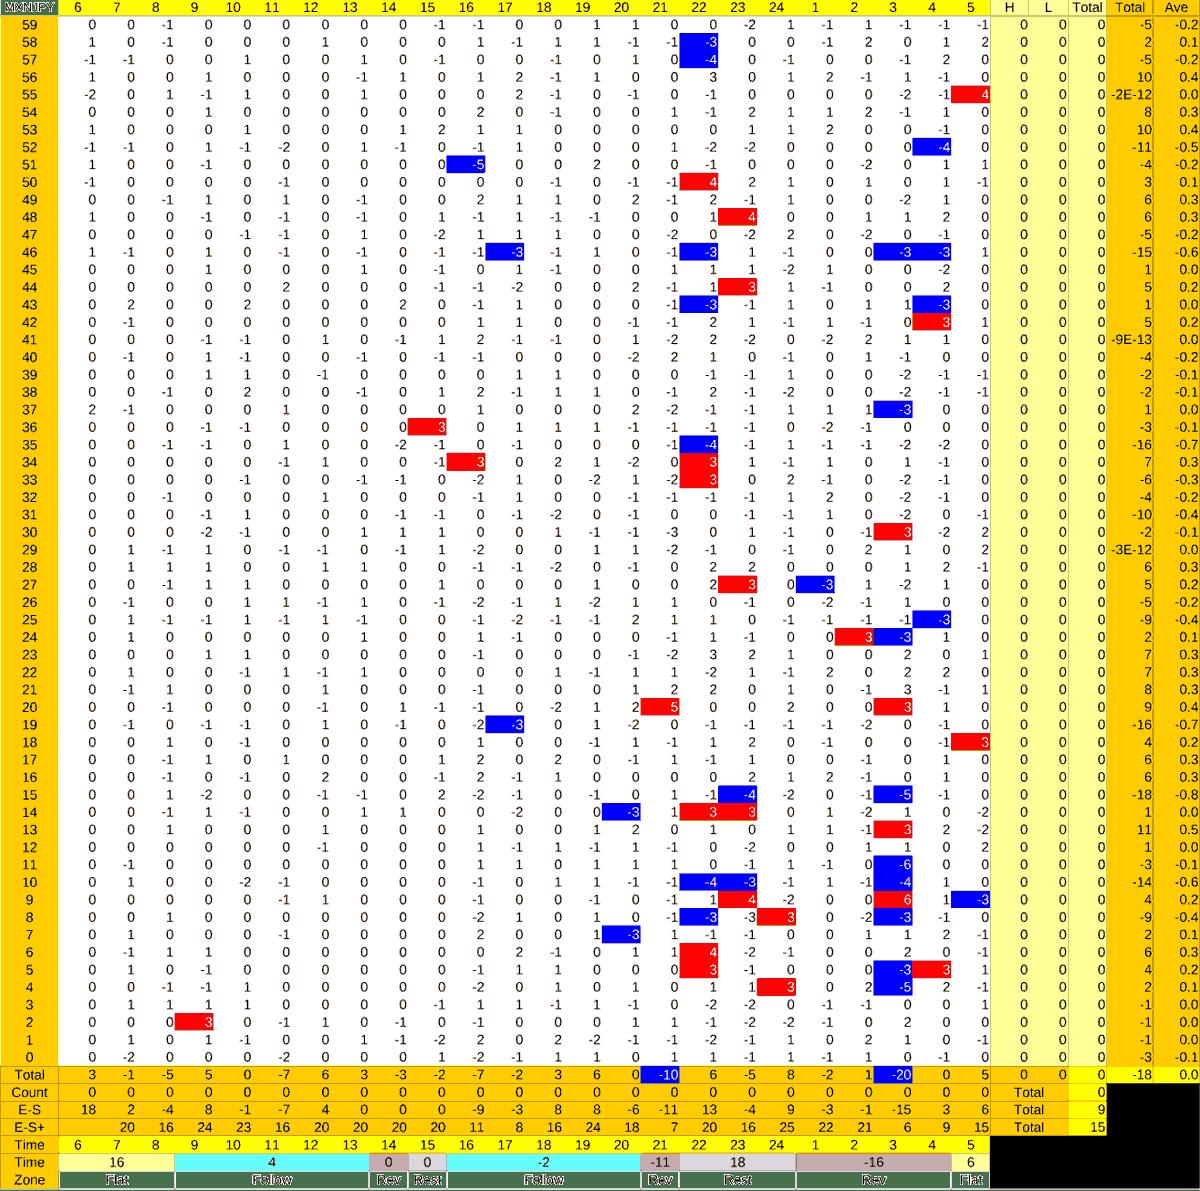 20210519_HS(3)MXNJPY